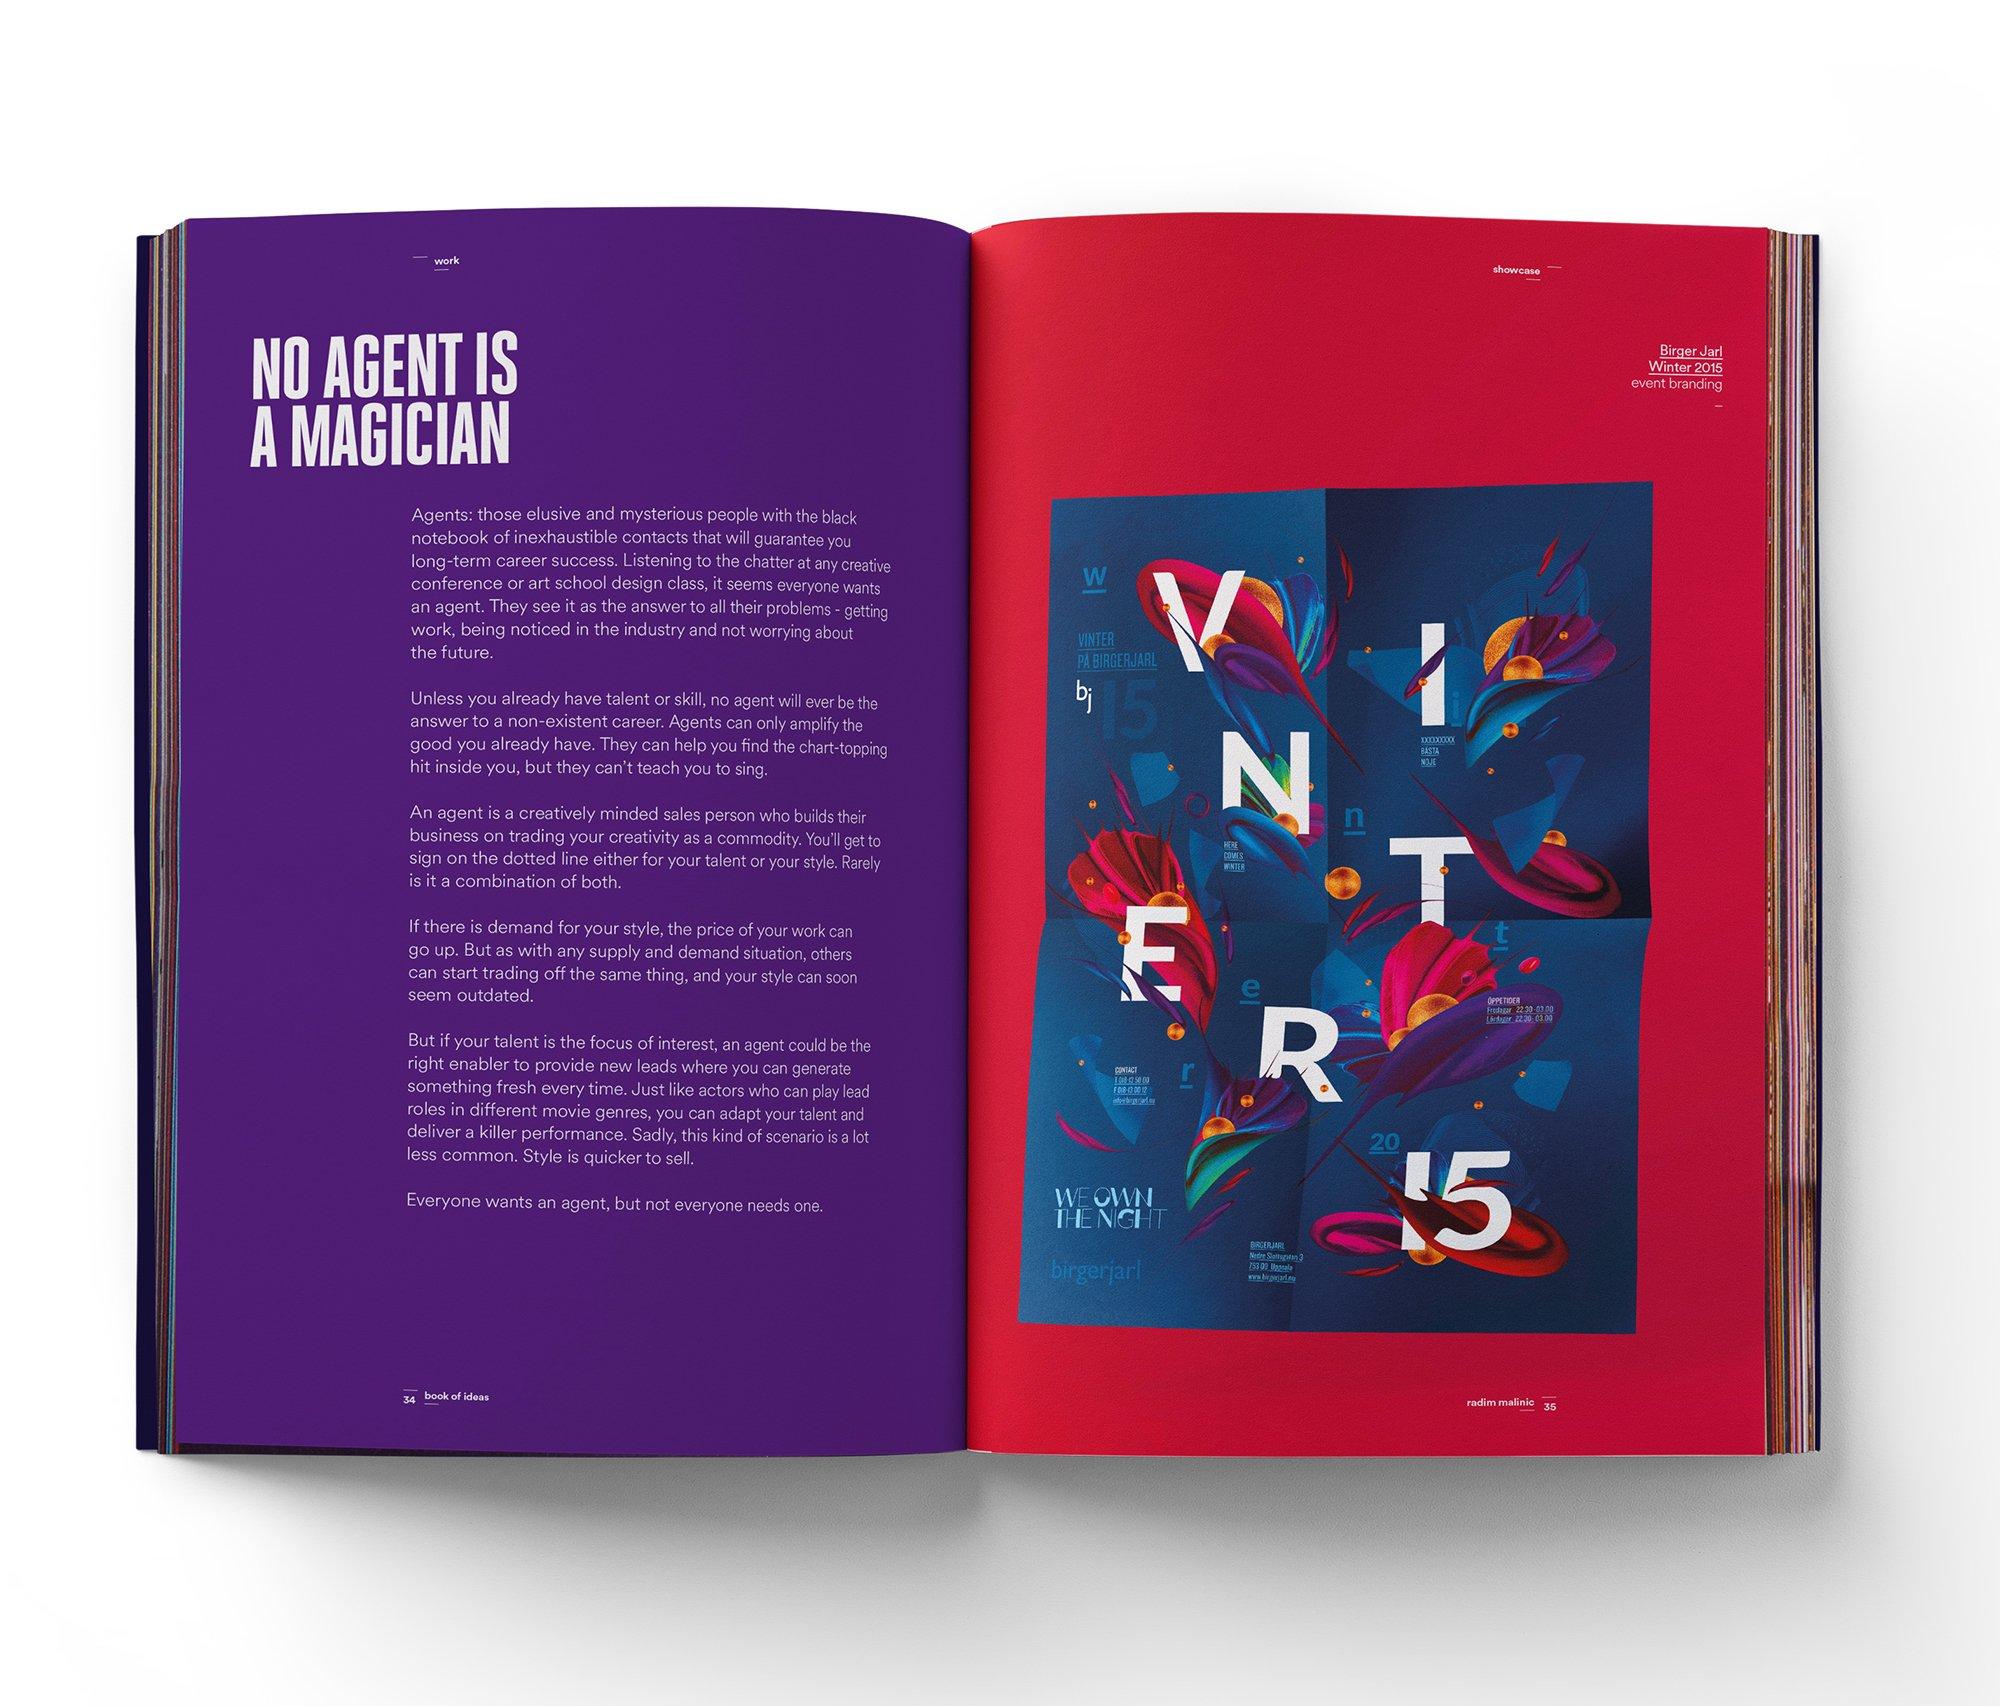 Creative Book Covers For School : Creative book cover ideas for school pertamini